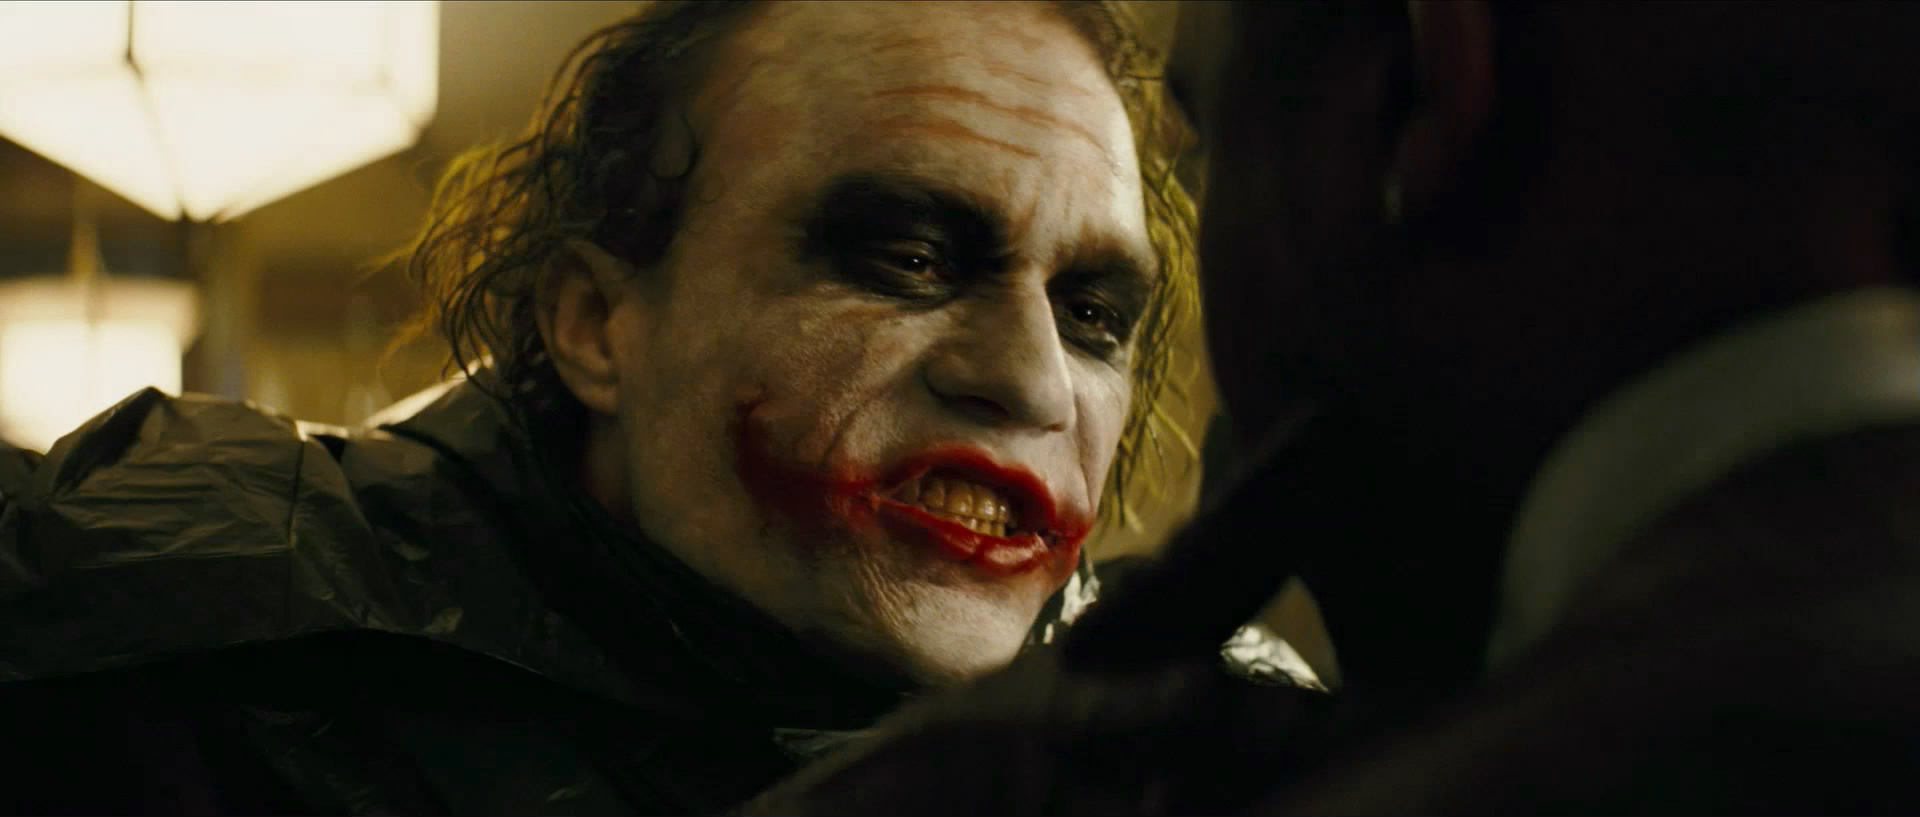 The Dark Knight (Film Review) | Film Geek Guy